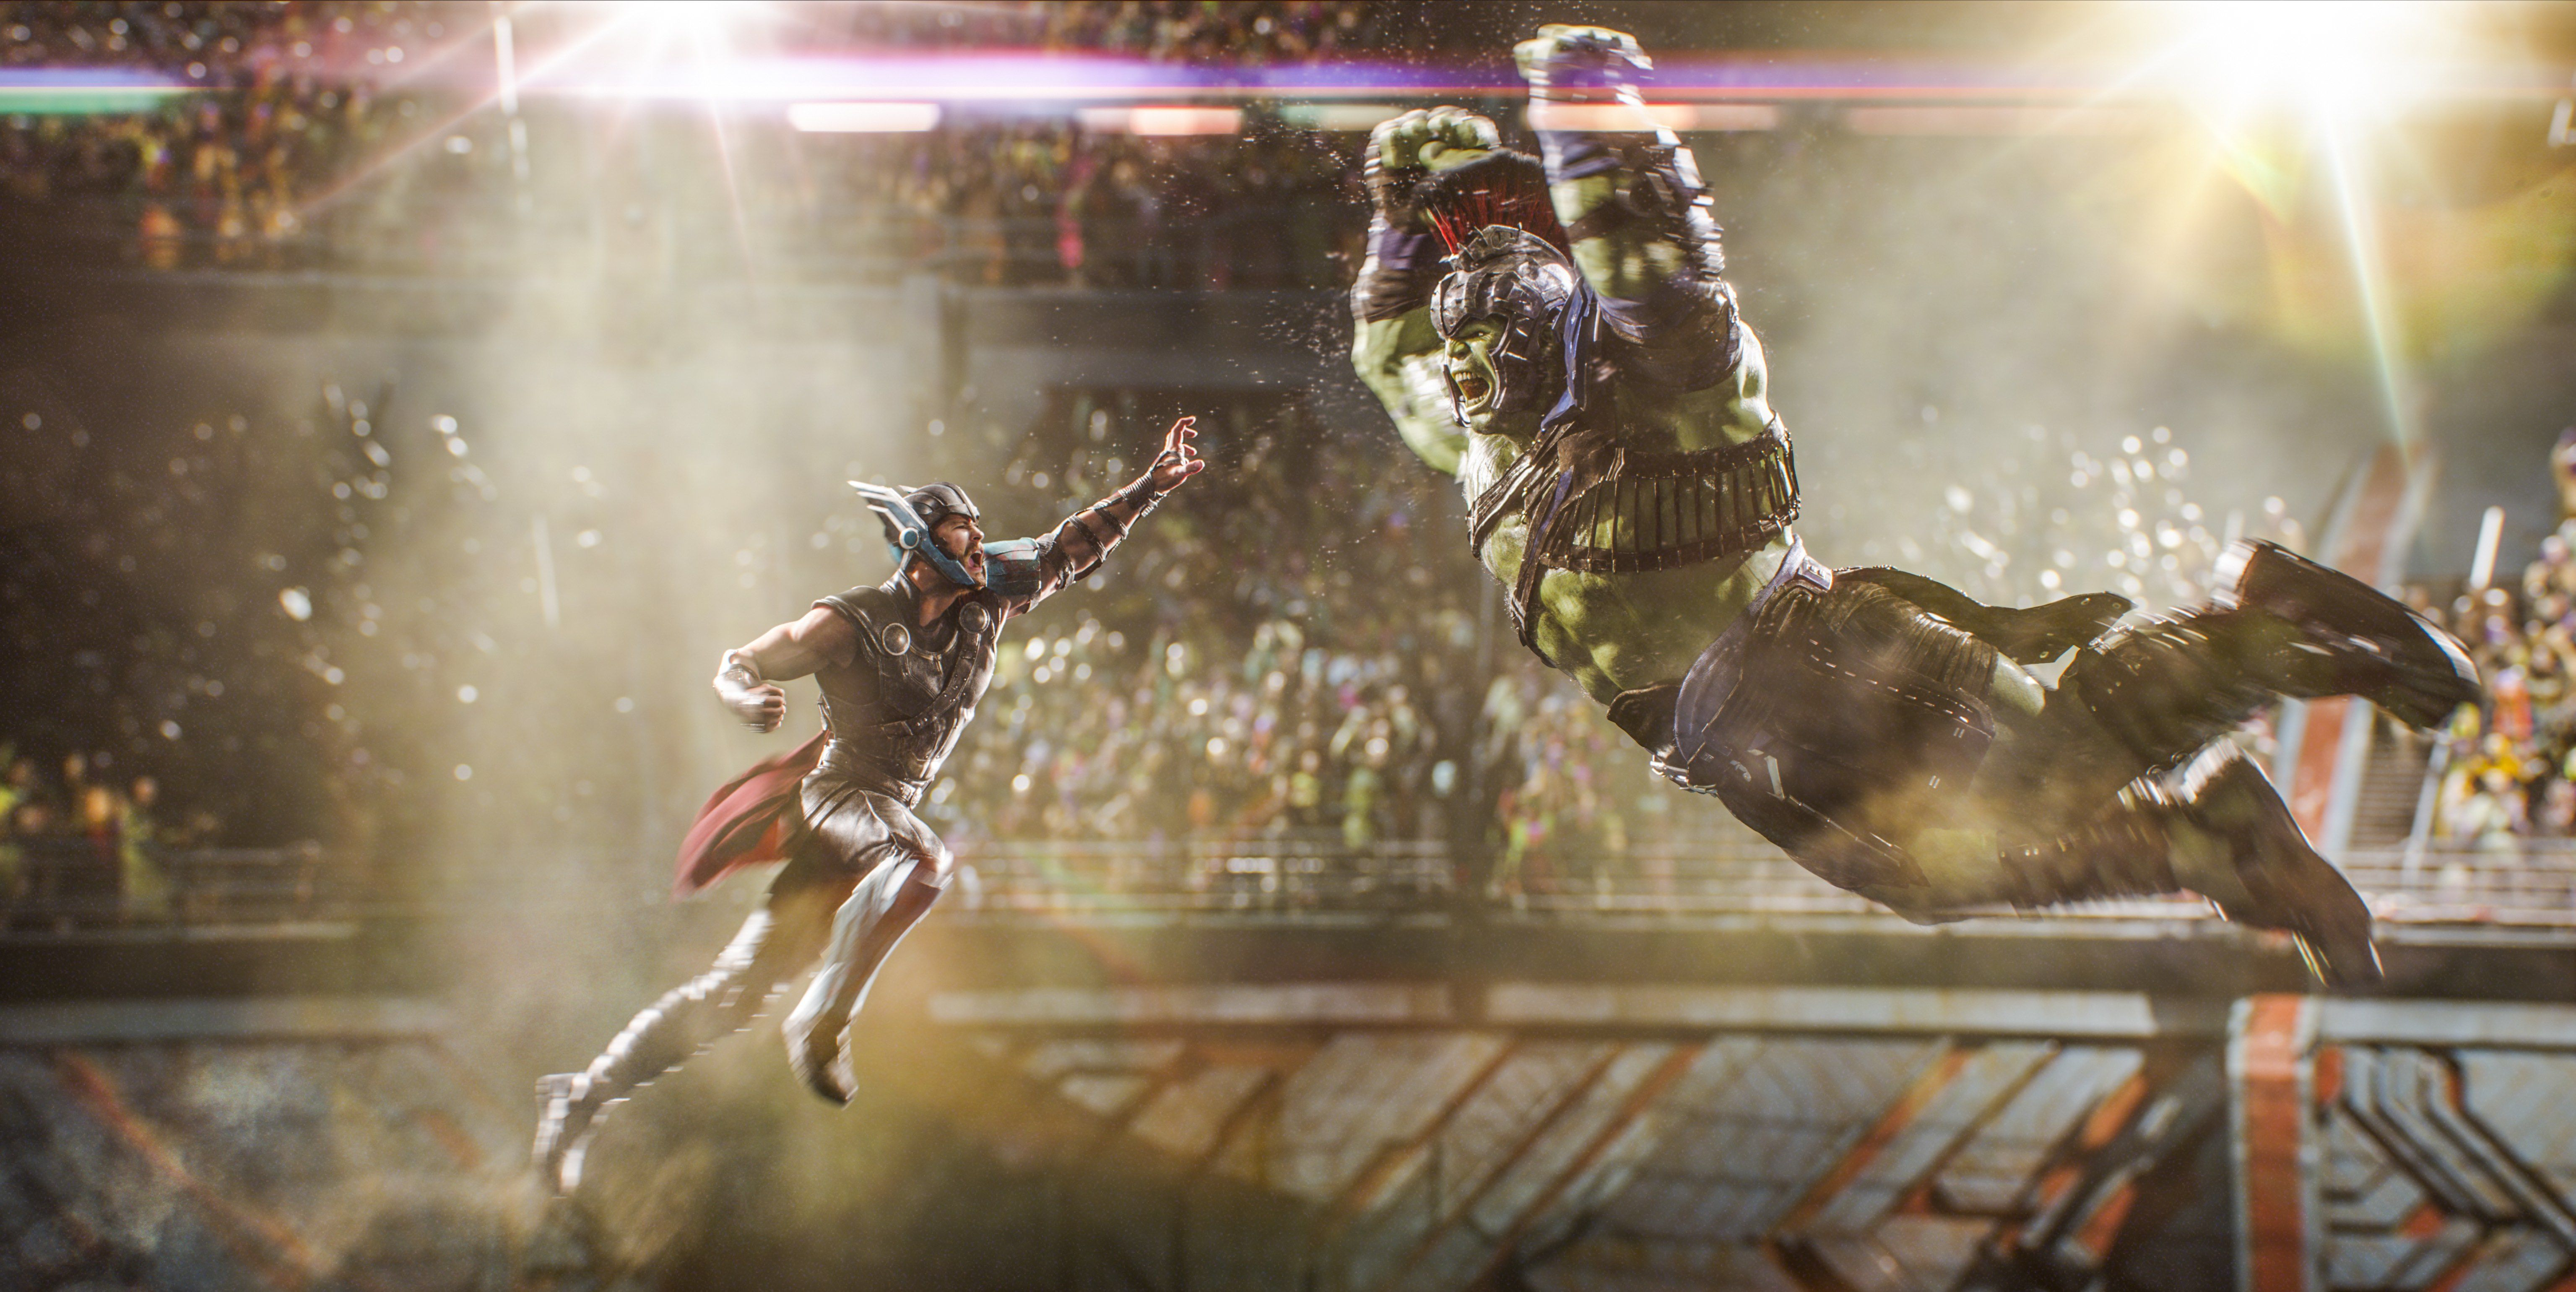 mejores películas superhéroes Netflix HBO Movistar+